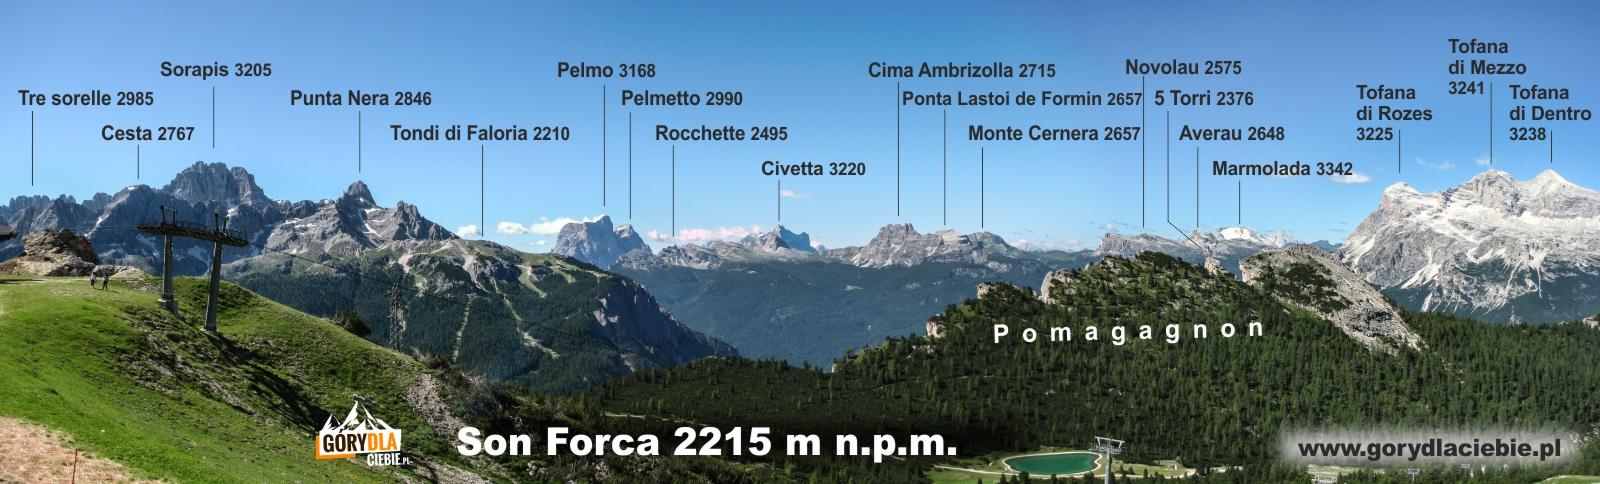 Panorama z opisem z Son Forca 2215 m